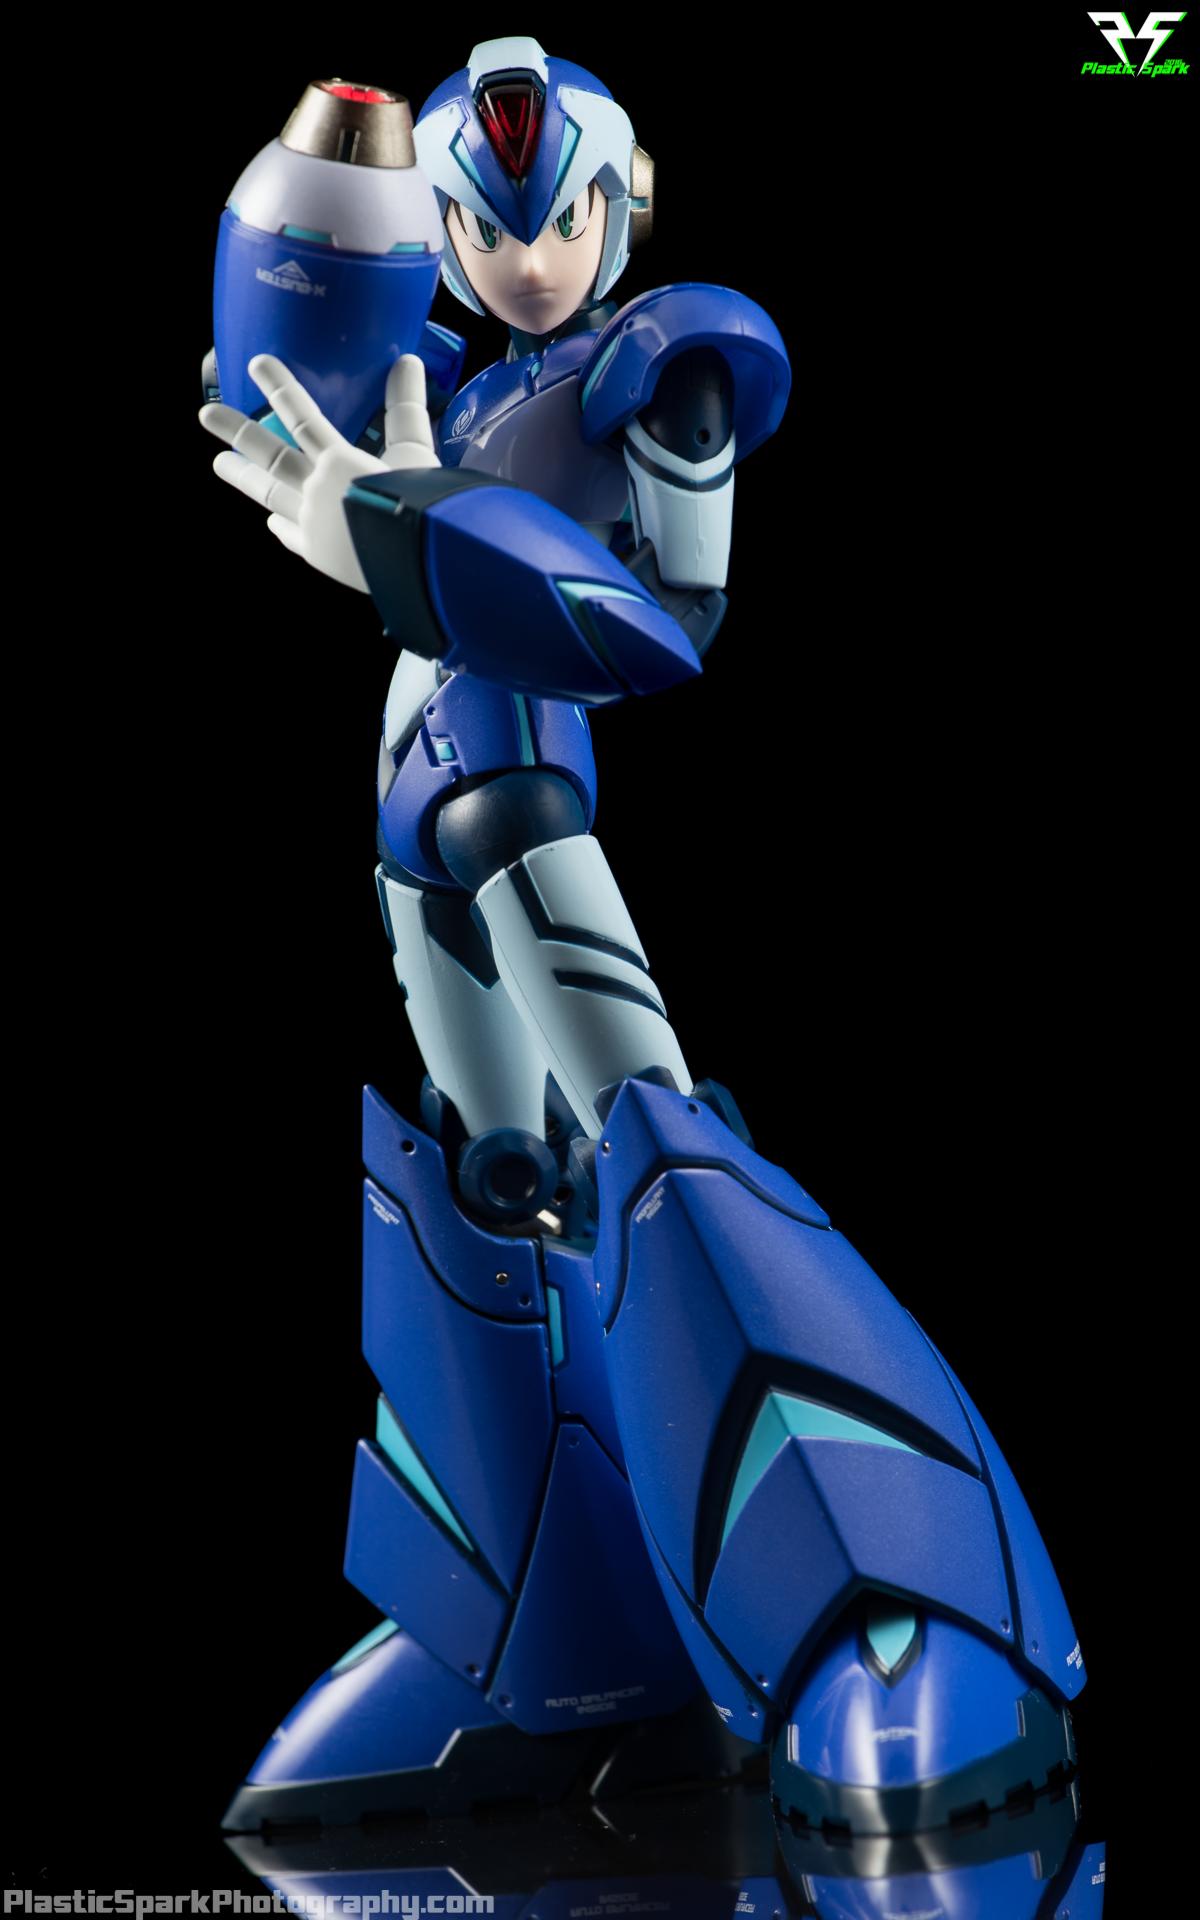 Truforce-Megaman-X-(7-of-17).png